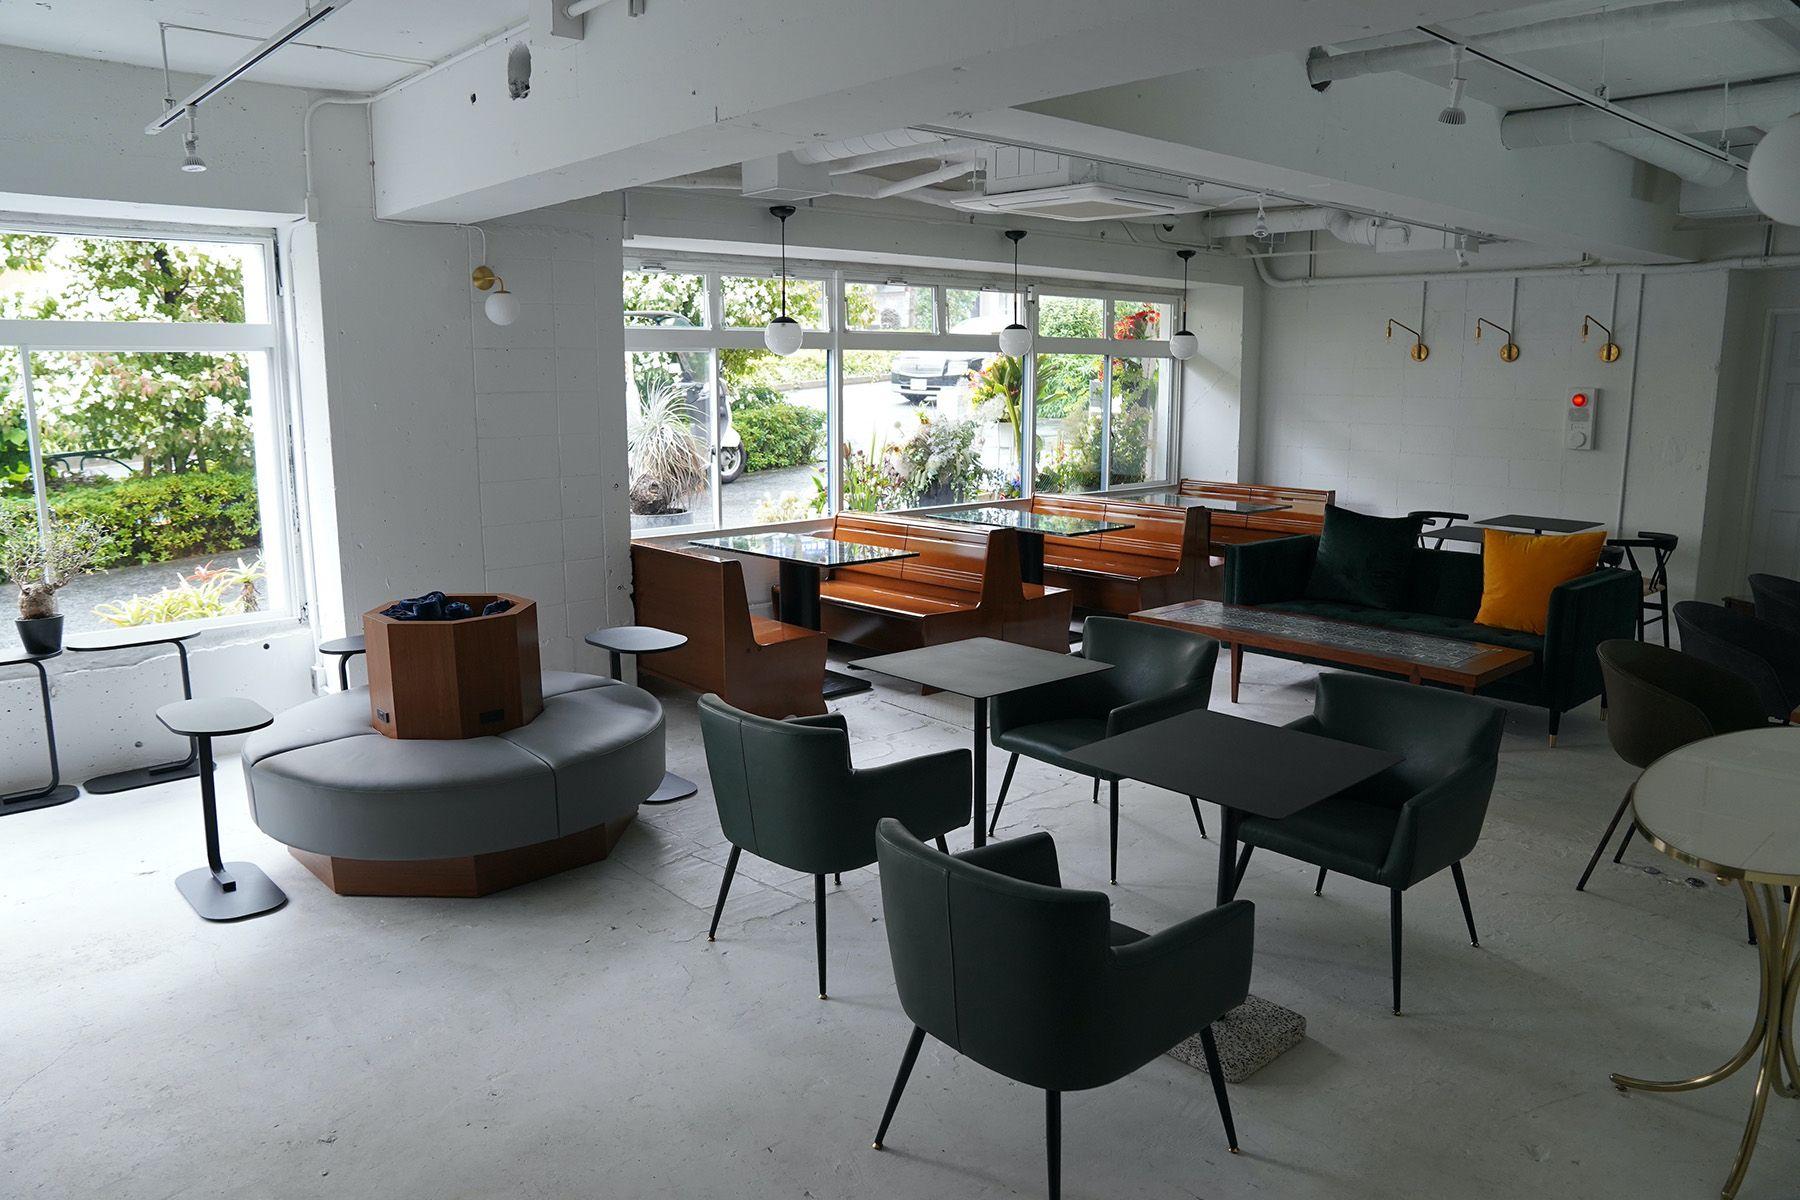 ANEA CAFÉ  松見坂/店舗 (アネアカフェ マツミザカ)開放感ある路面店